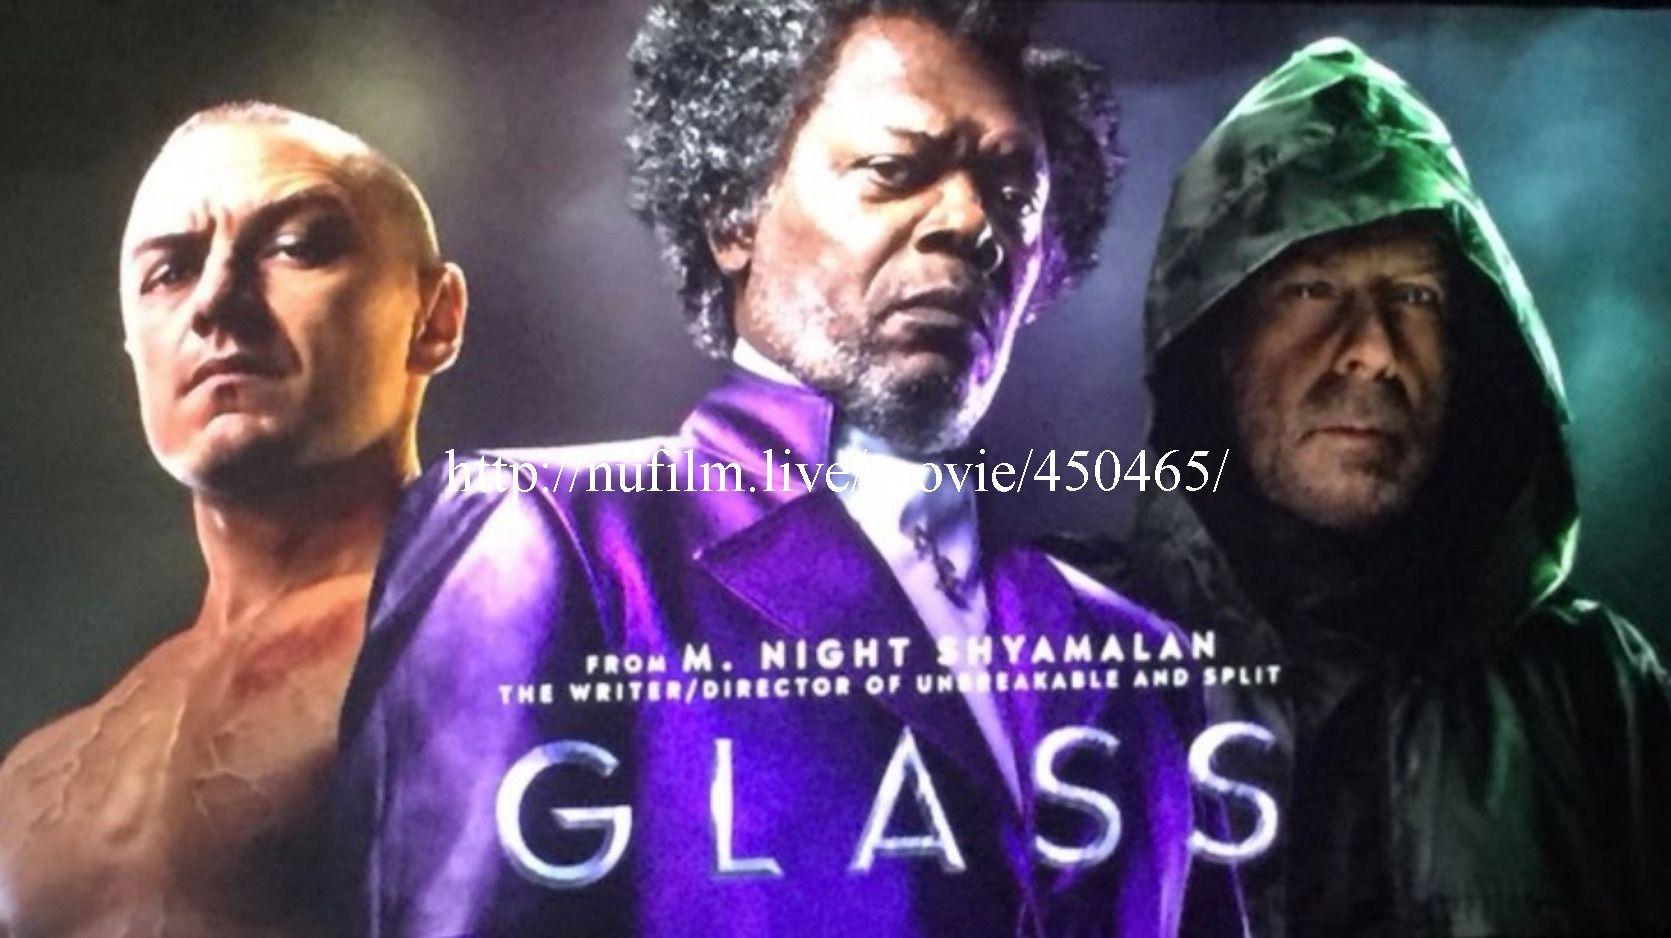 123movie Watch Glass Online 2019 Full Streaming Free Movie Hd Sub En Gilr Film Baru Bruce Willis Film